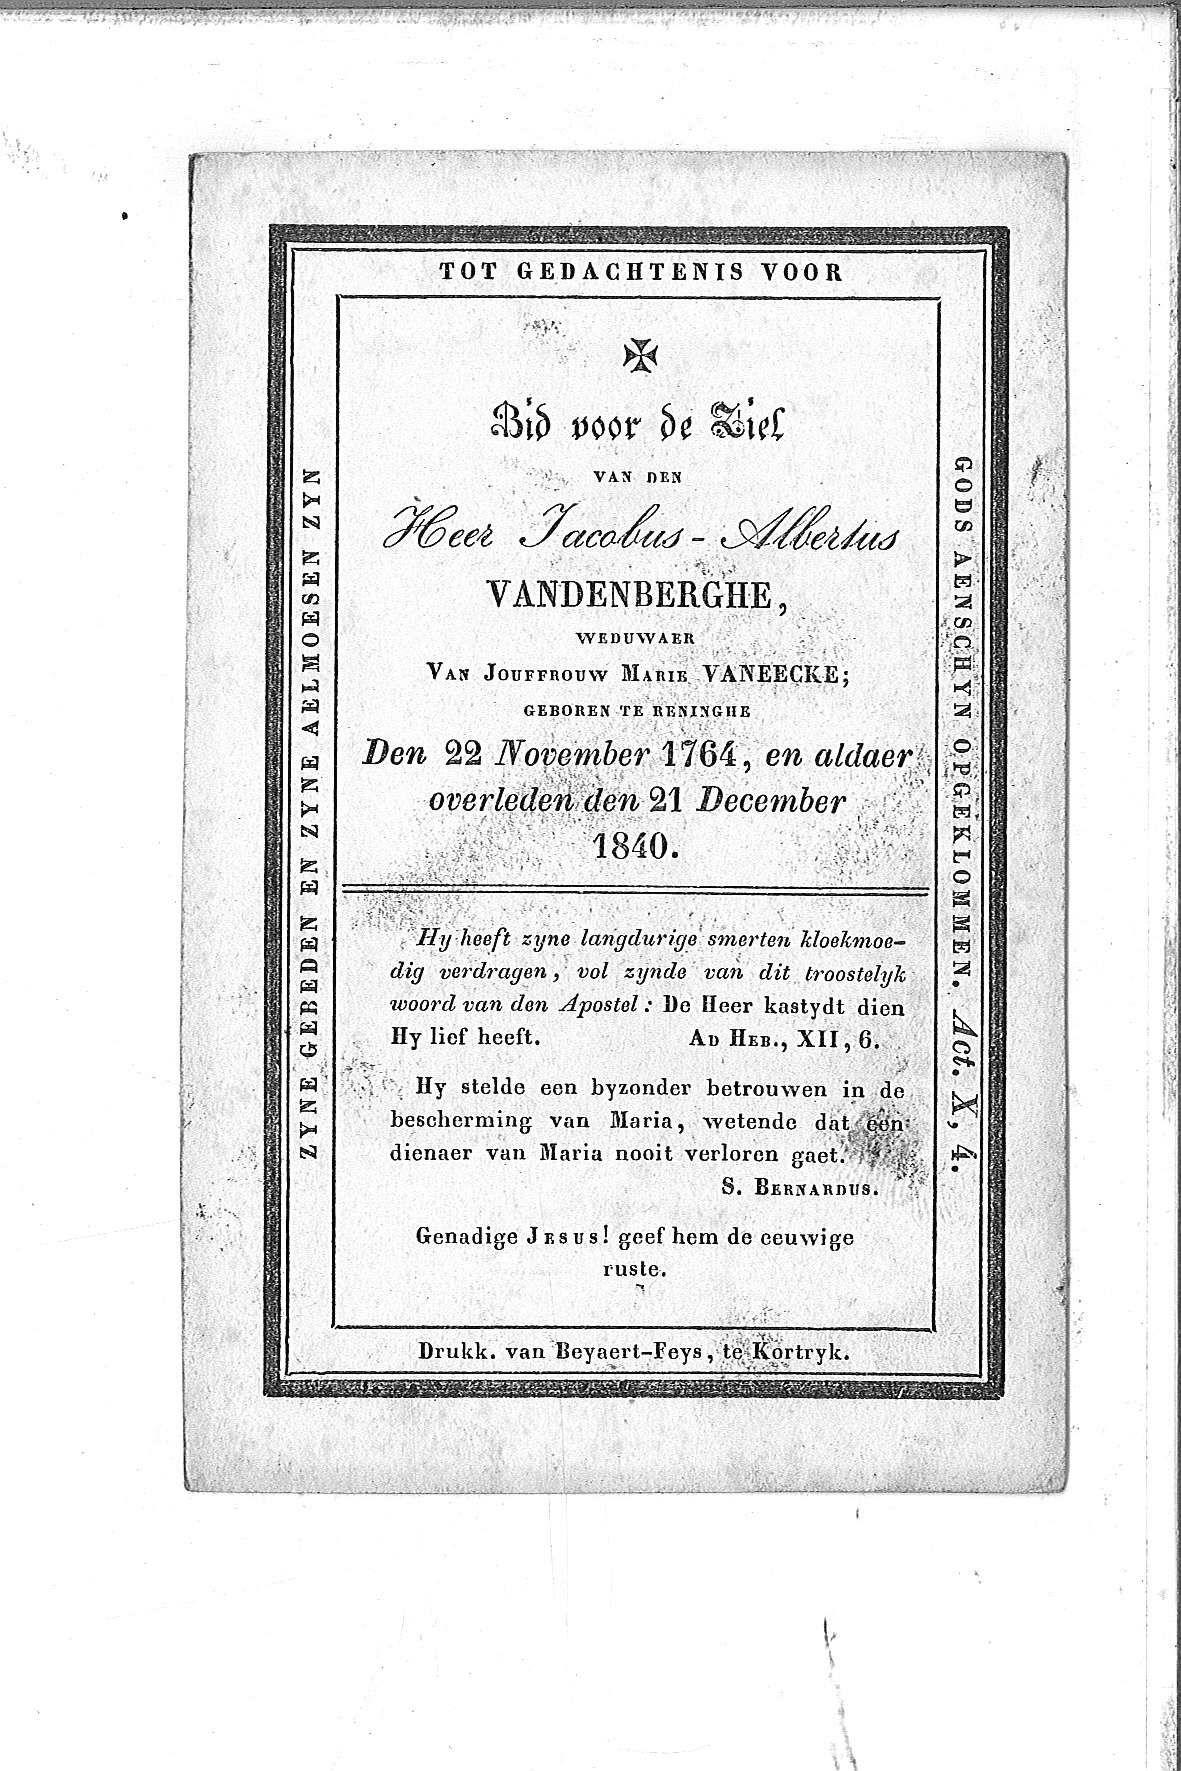 Jacobus-Albertus(1840)20140715135556_00056.jpg